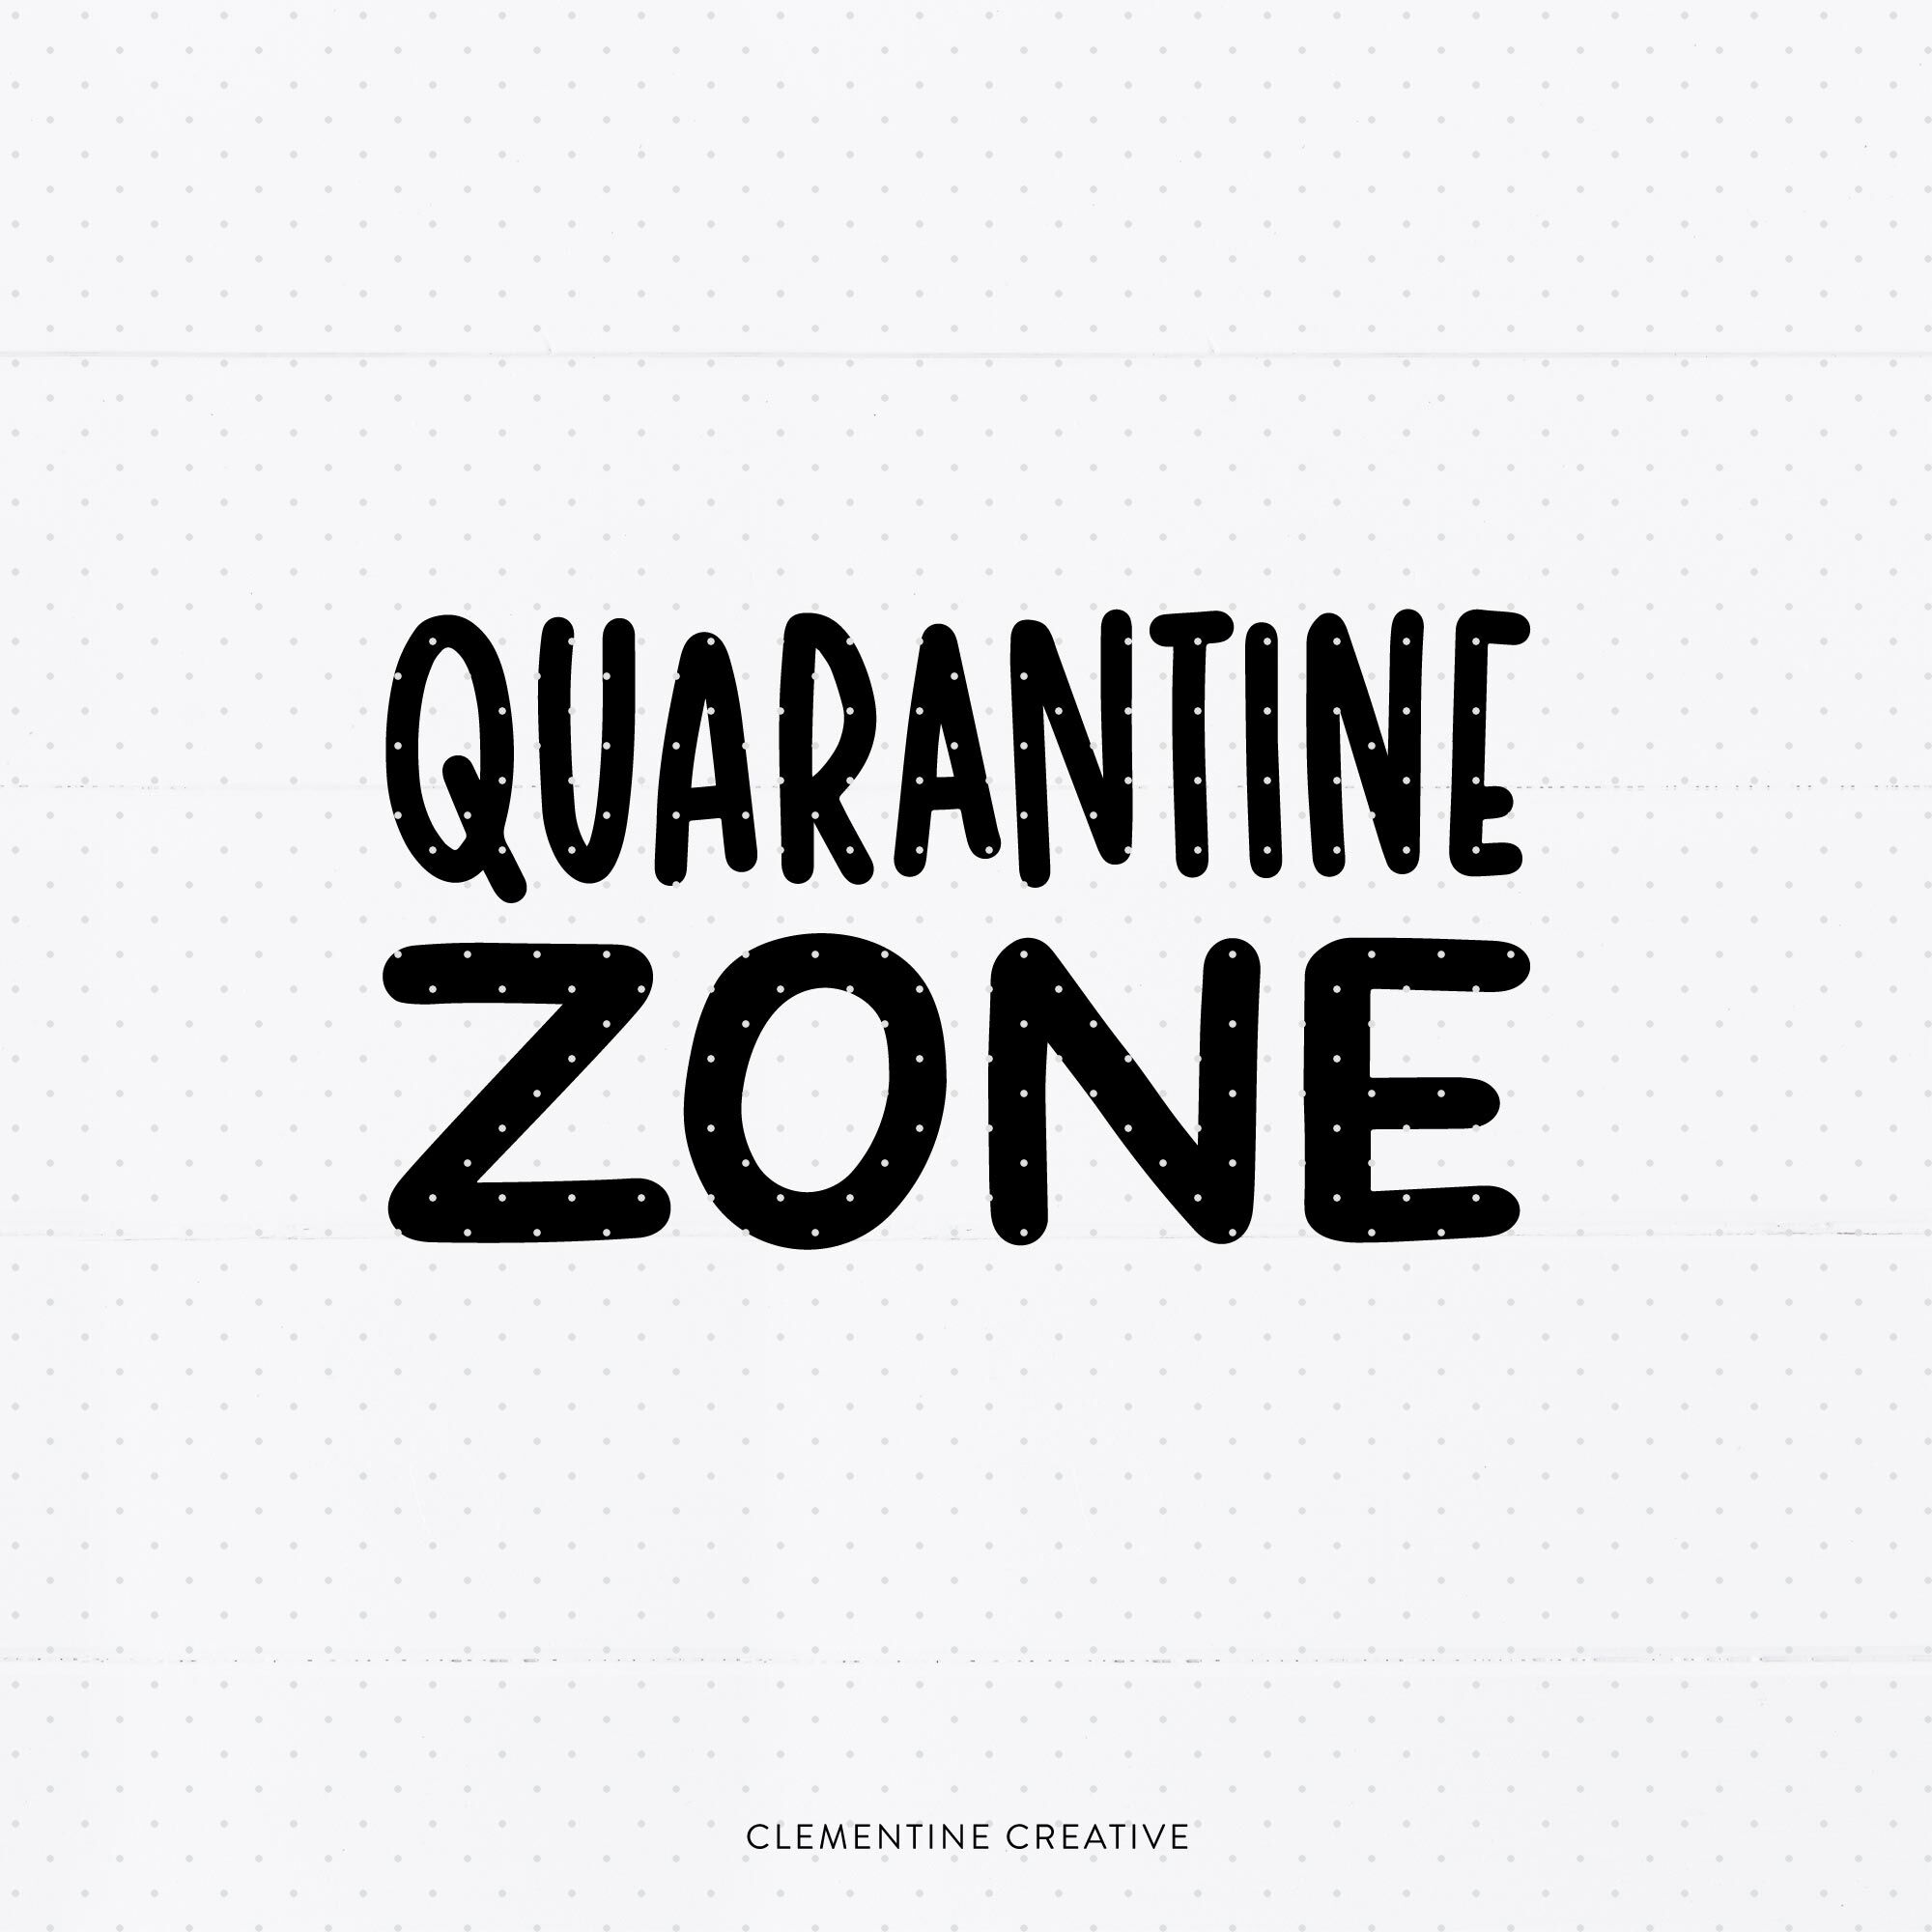 Quarantine Zone Svg By Clementine Creative Thehungryjpeg Com